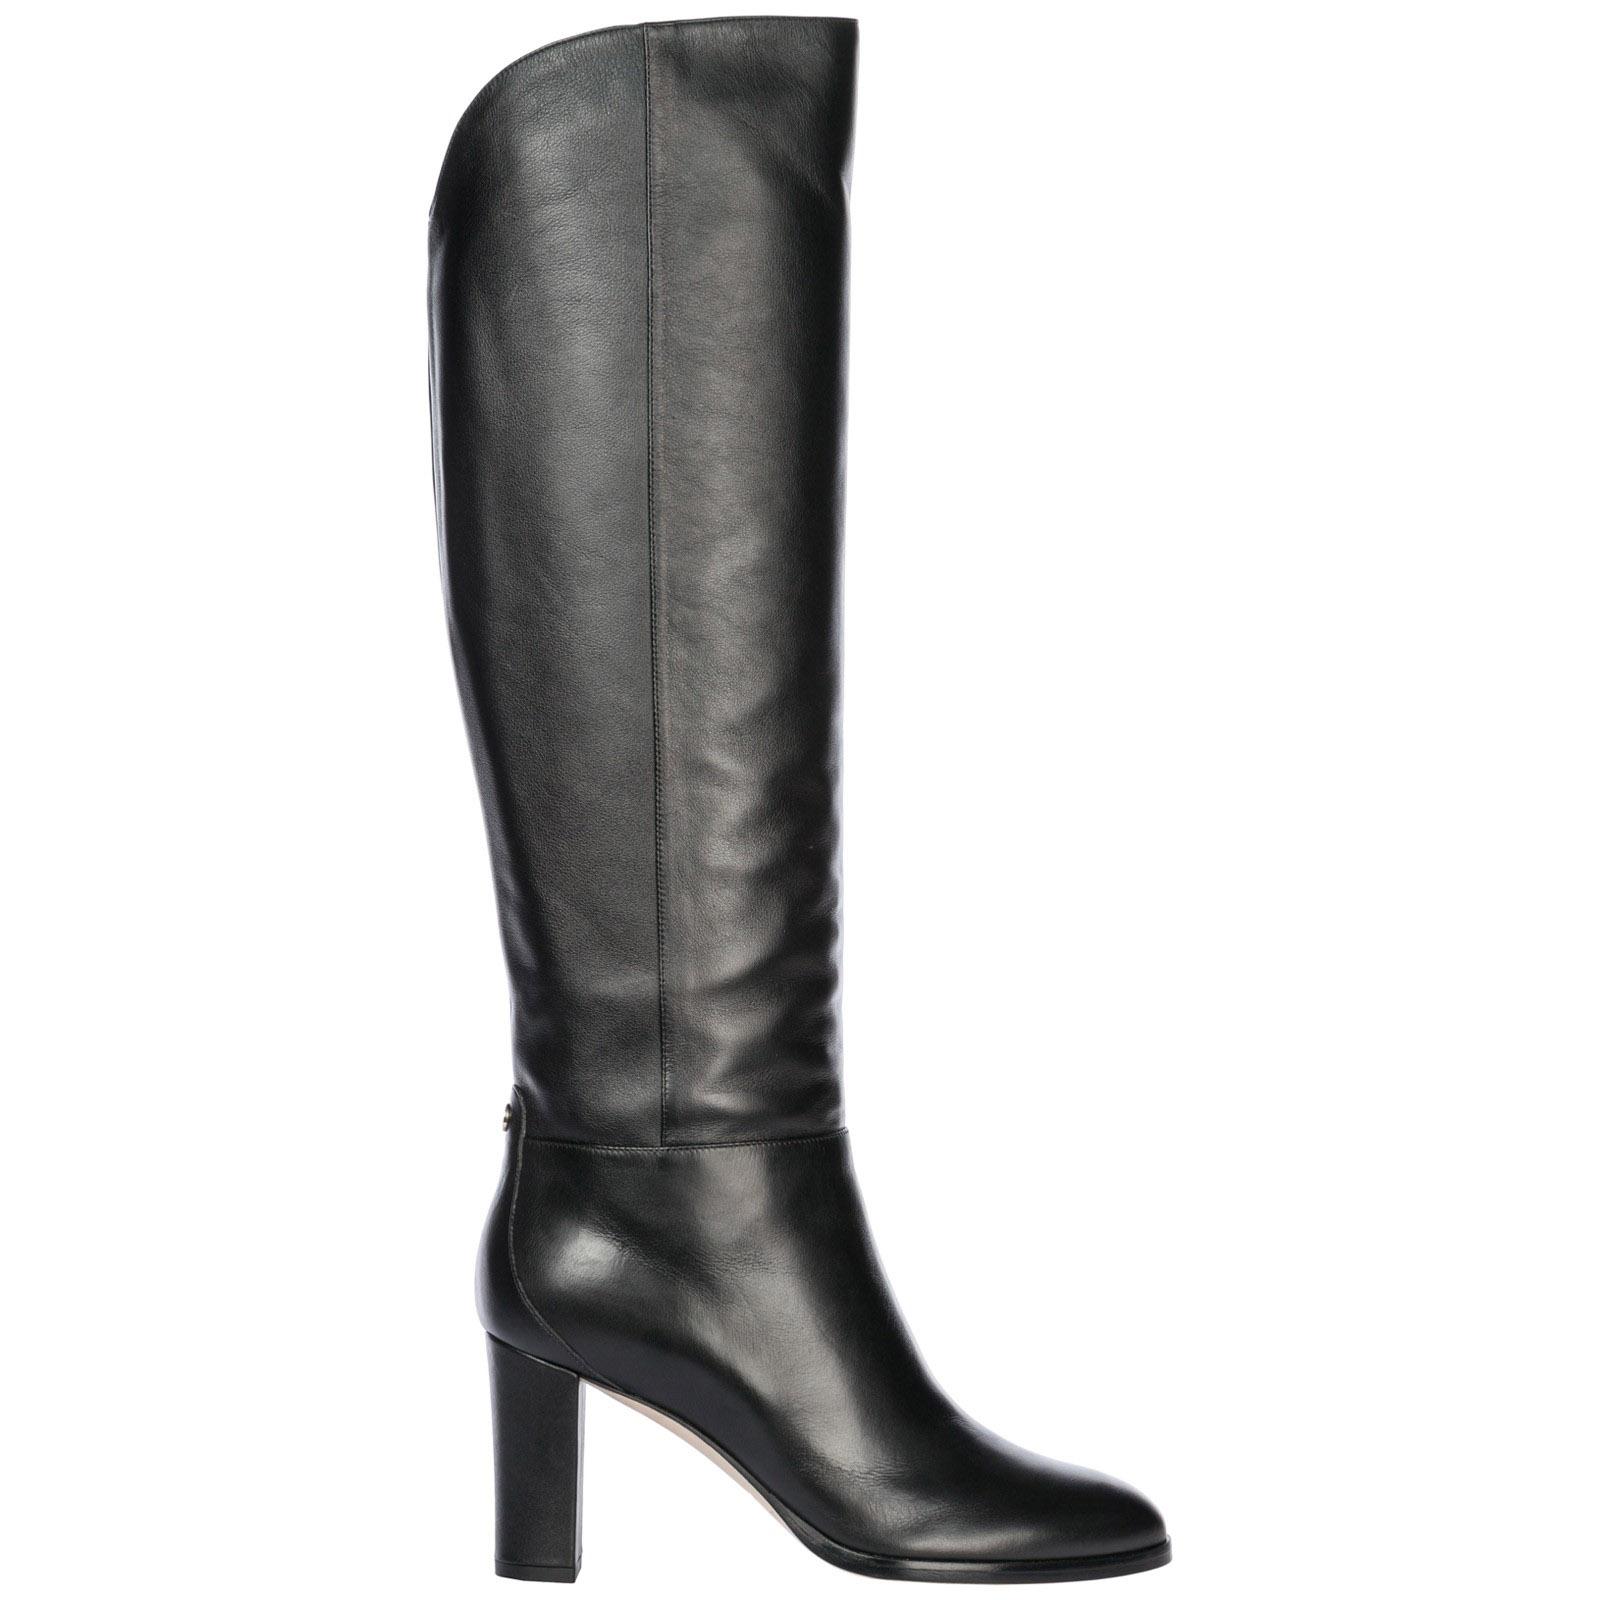 01a2c19d9df Jimmy Choo Women S Madalie 80 High Block-Heel Boots In Black